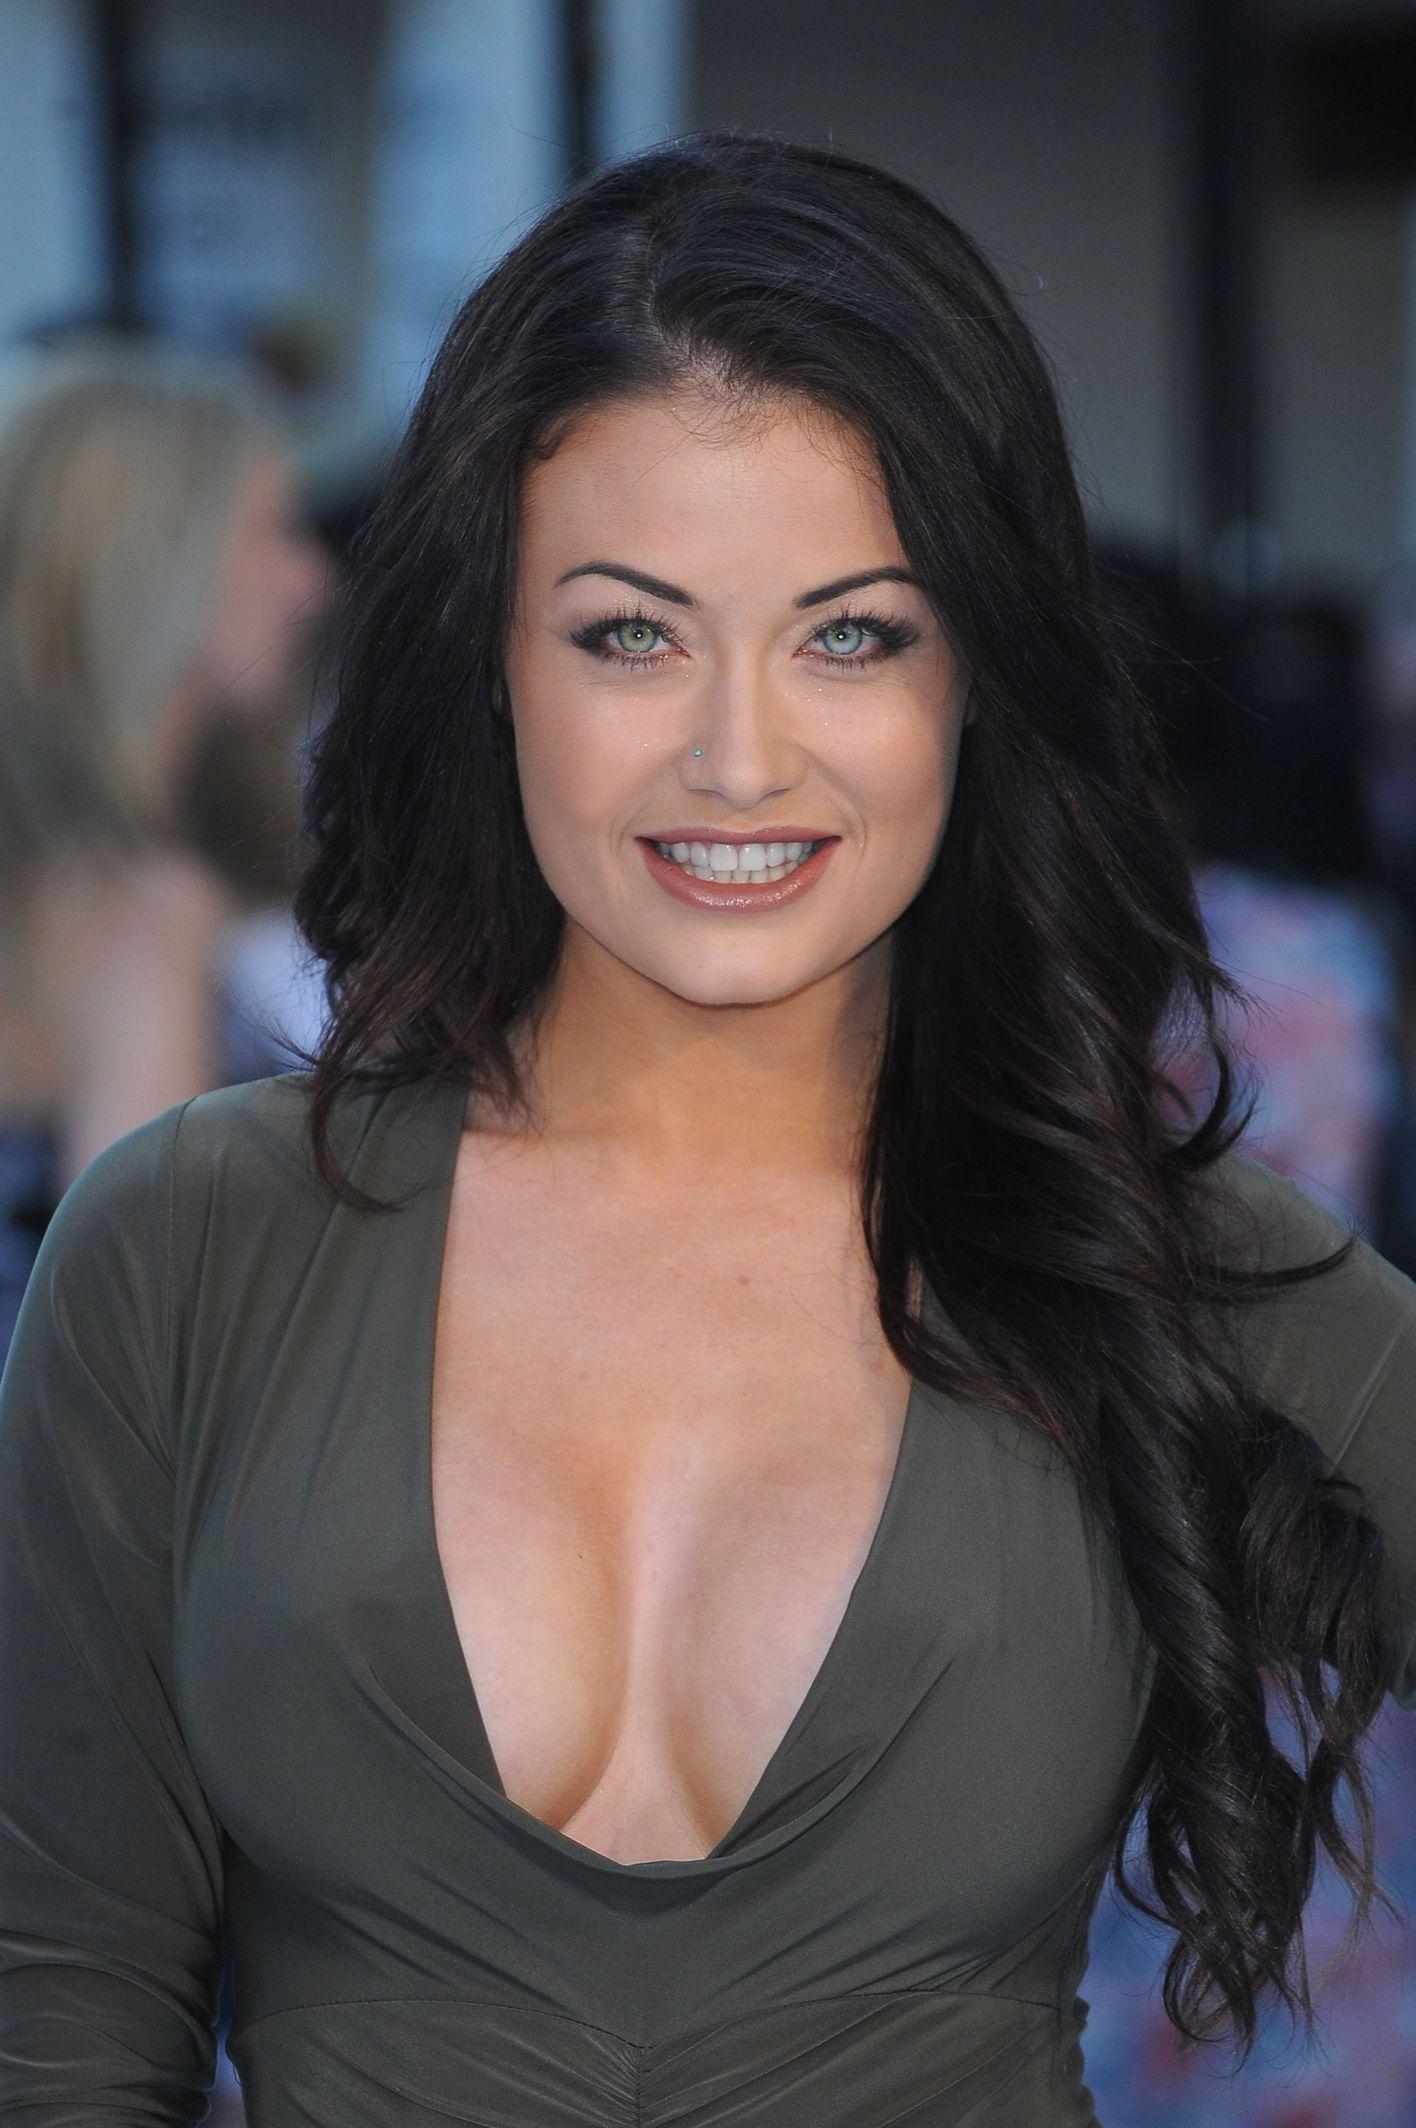 Jess Impiazzi Cleavage